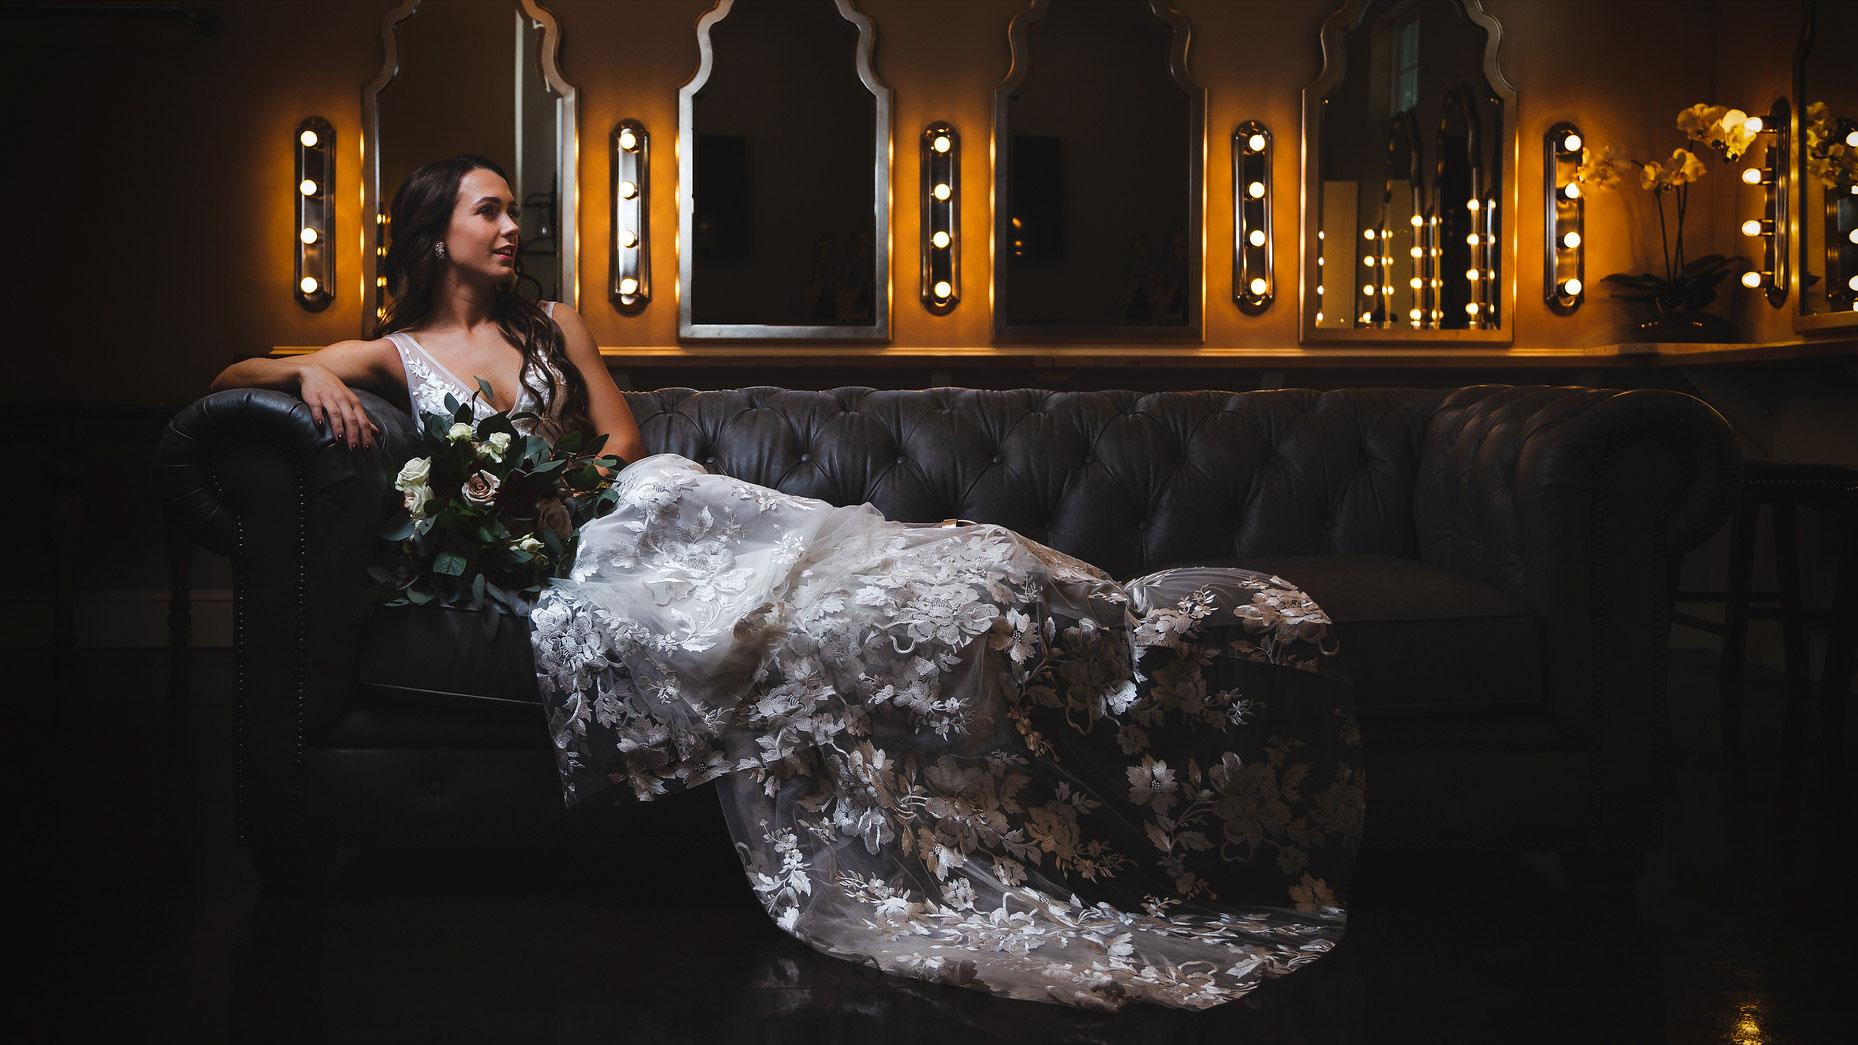 adam-szarmack-bowing-oaks-wedding-photographer-jacksonville-6.jpg